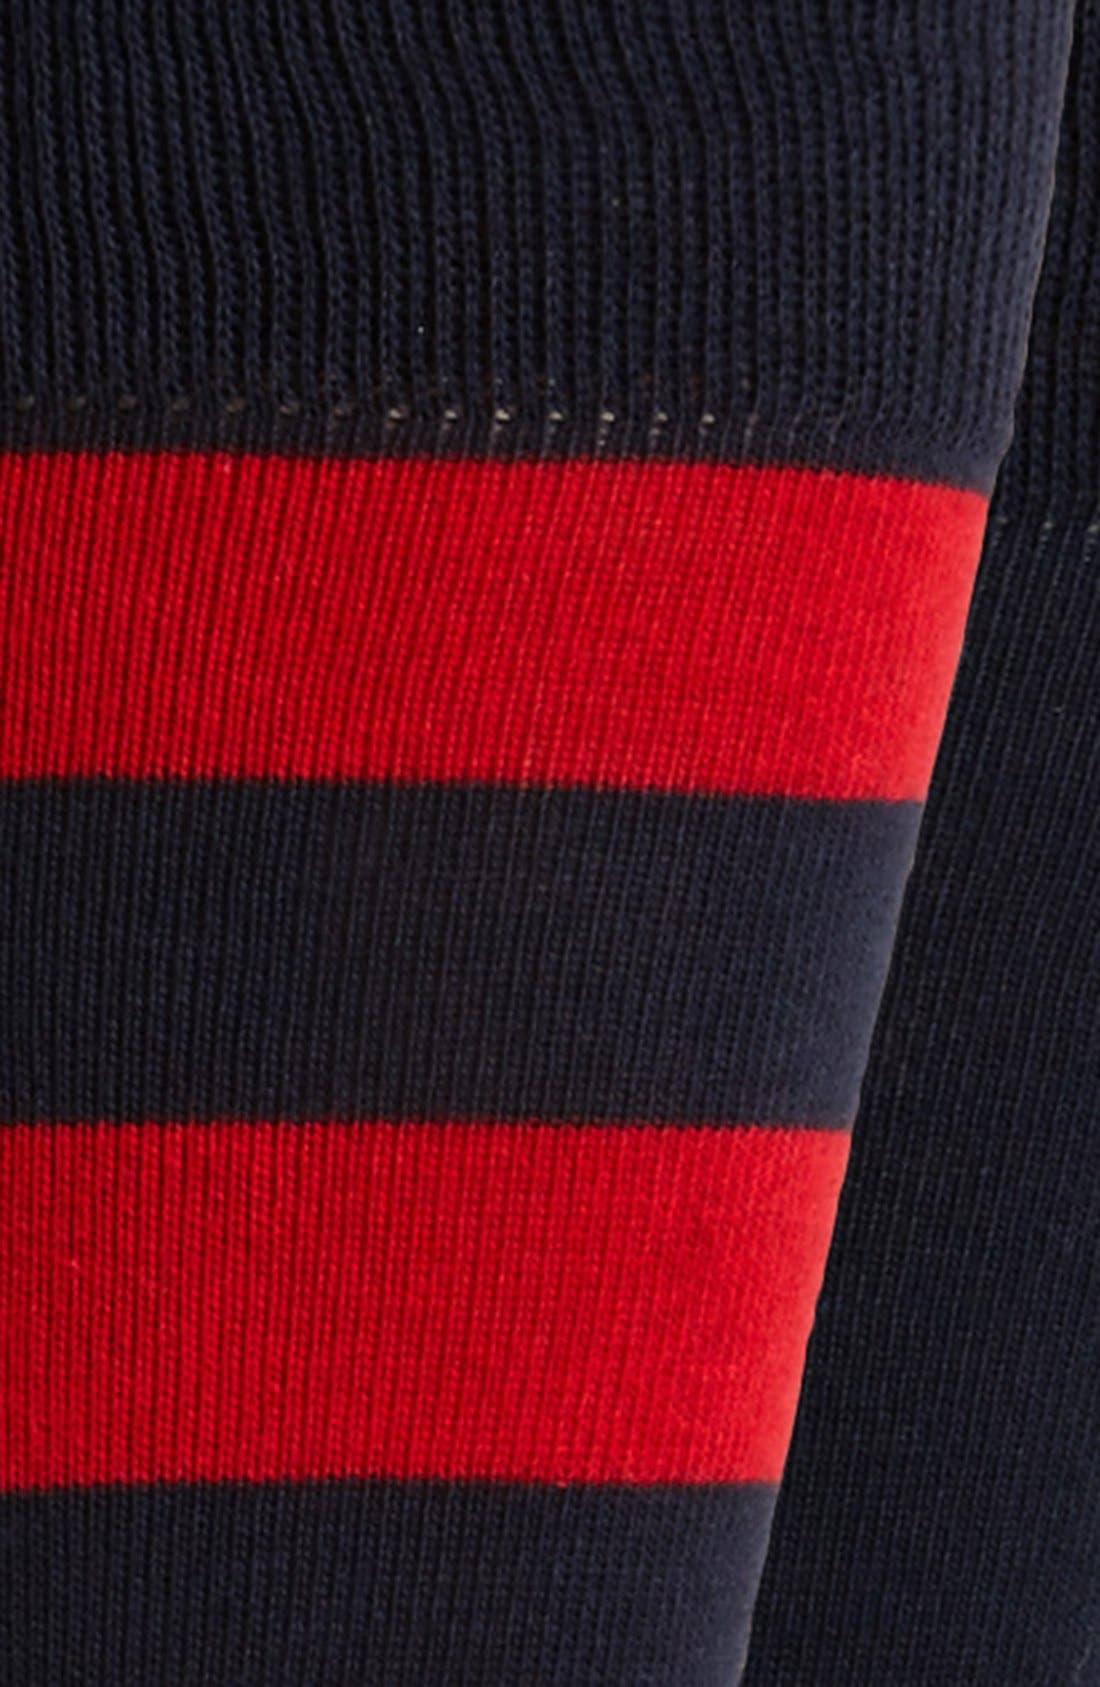 Cotton Blend Socks,                             Alternate thumbnail 35, color,